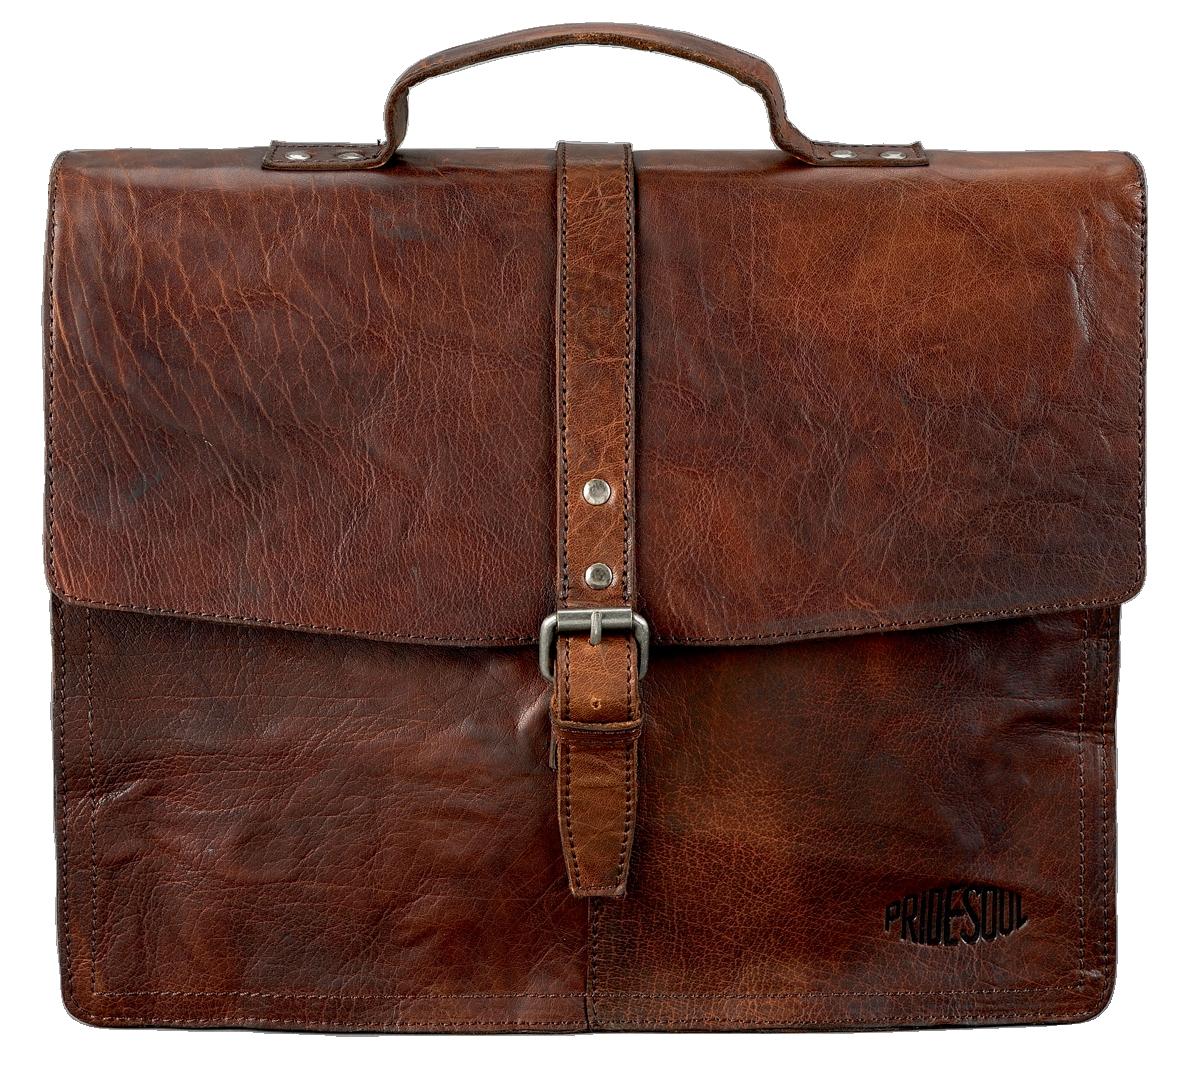 Pride&Soul Jayden Laptop Bag  Brn 47183